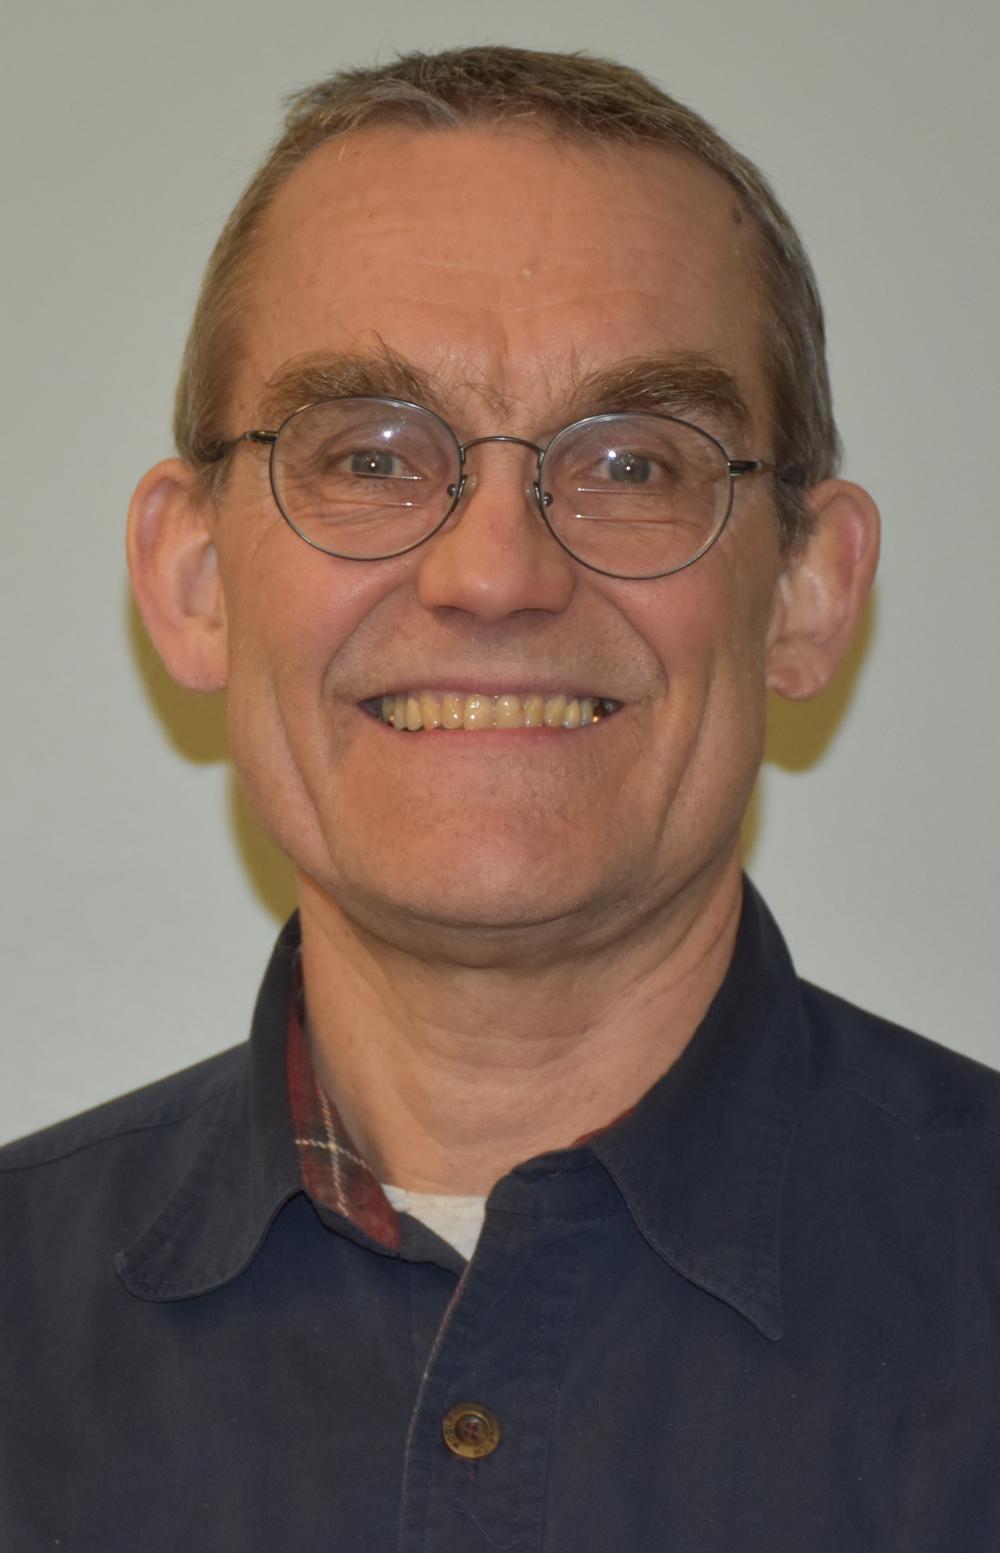 Larry Smith, President